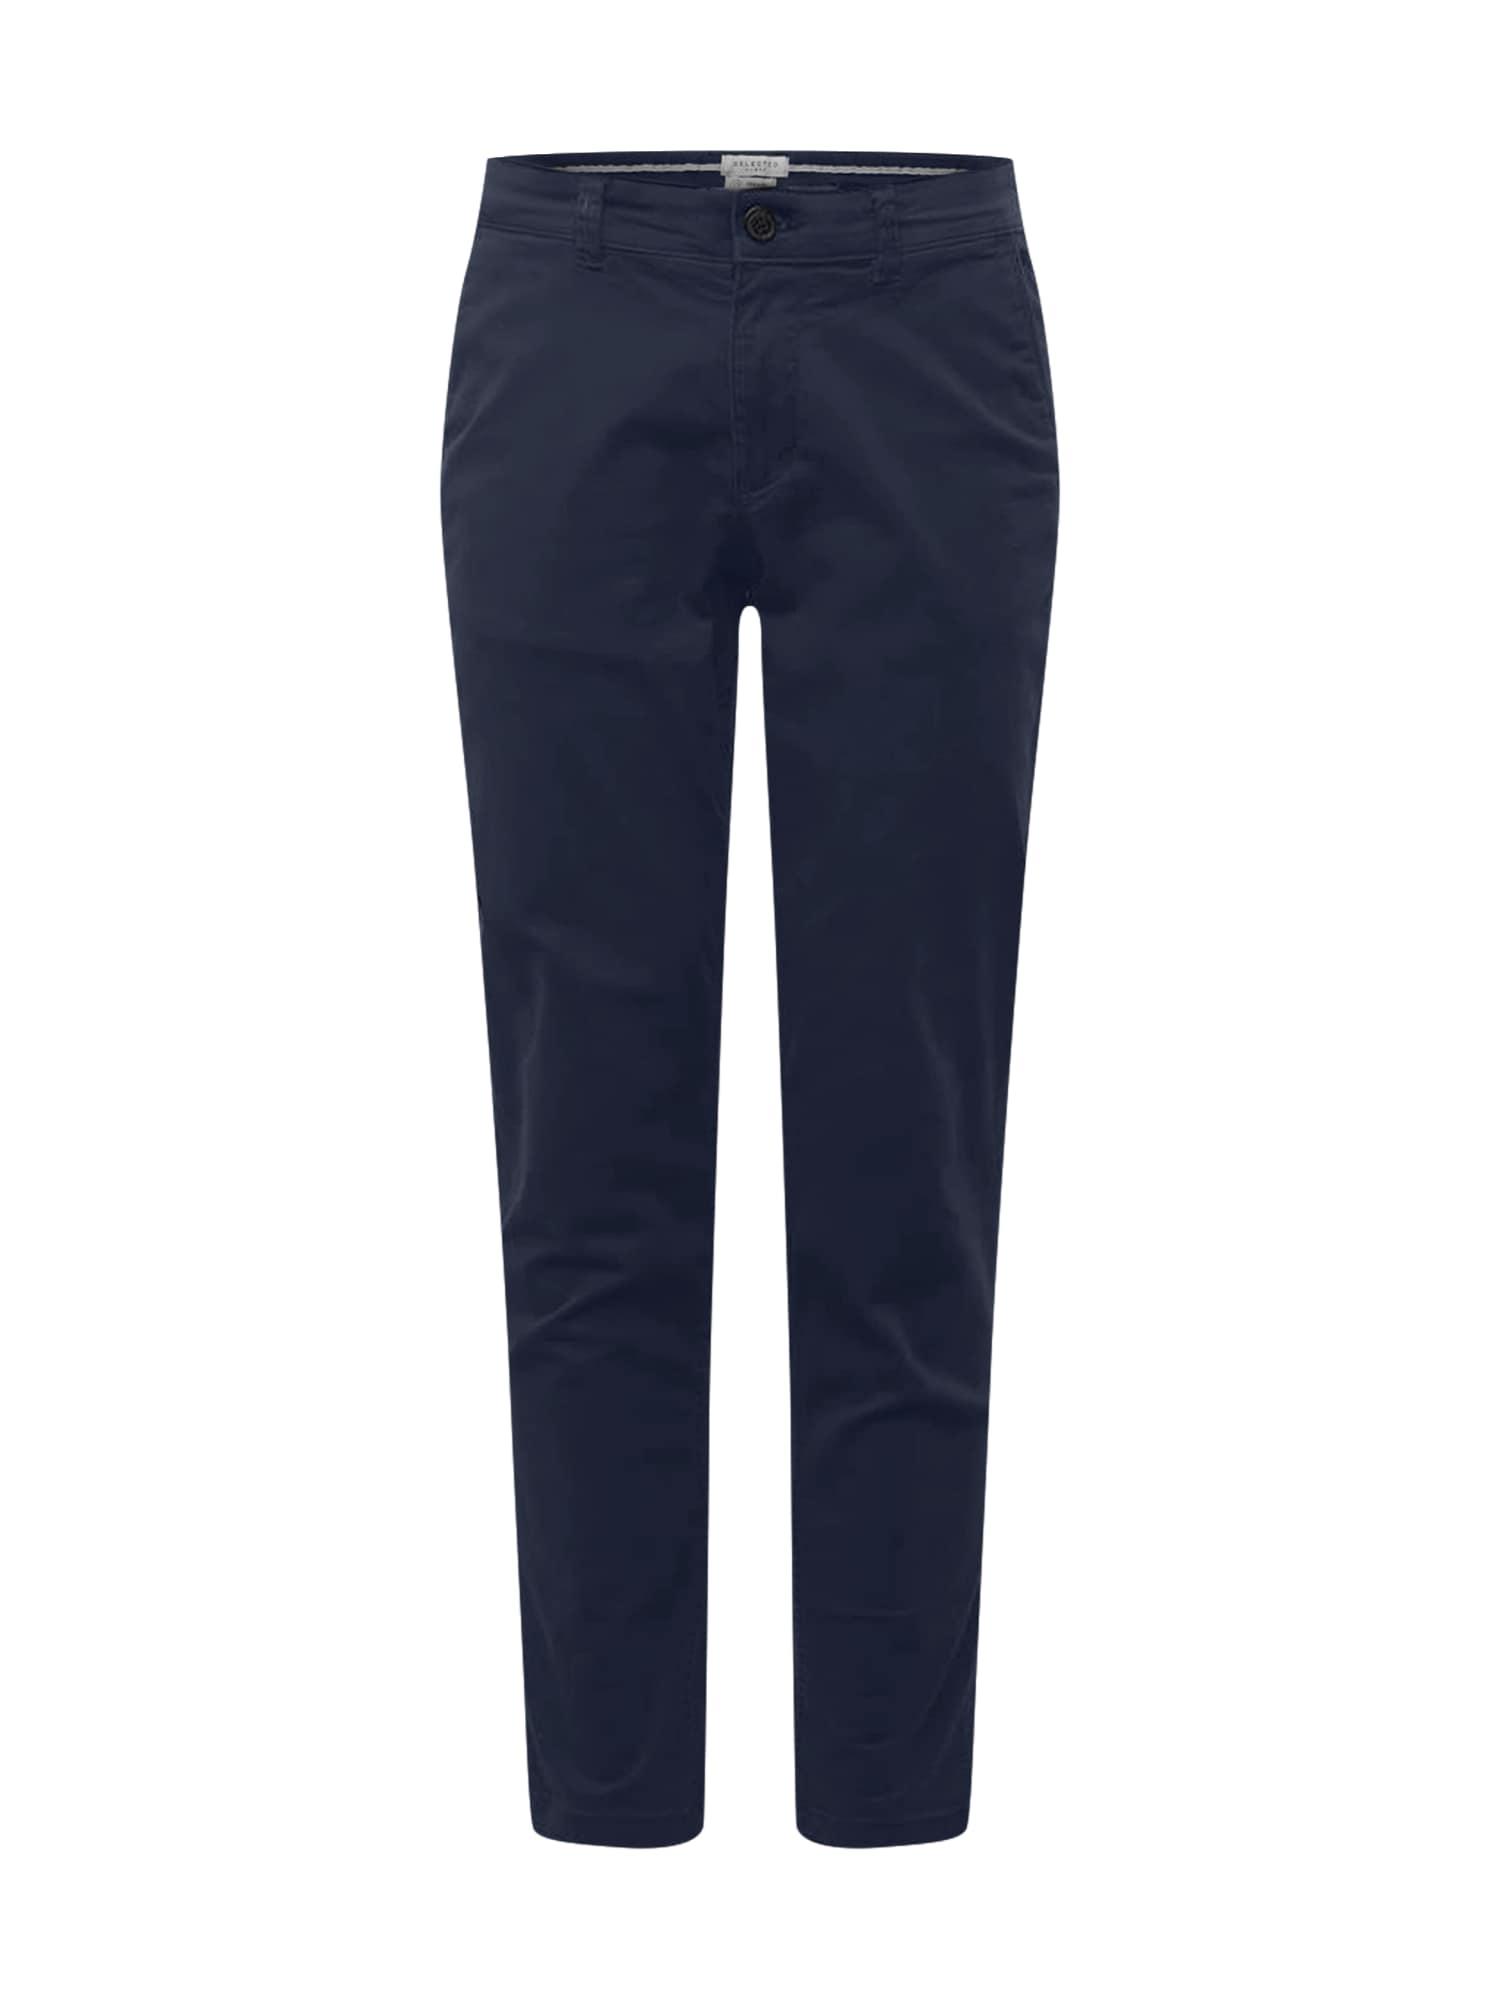 SELECTED HOMME Pantalon chino 'NEW PARIS'  - Bleu - Taille: 36 - male